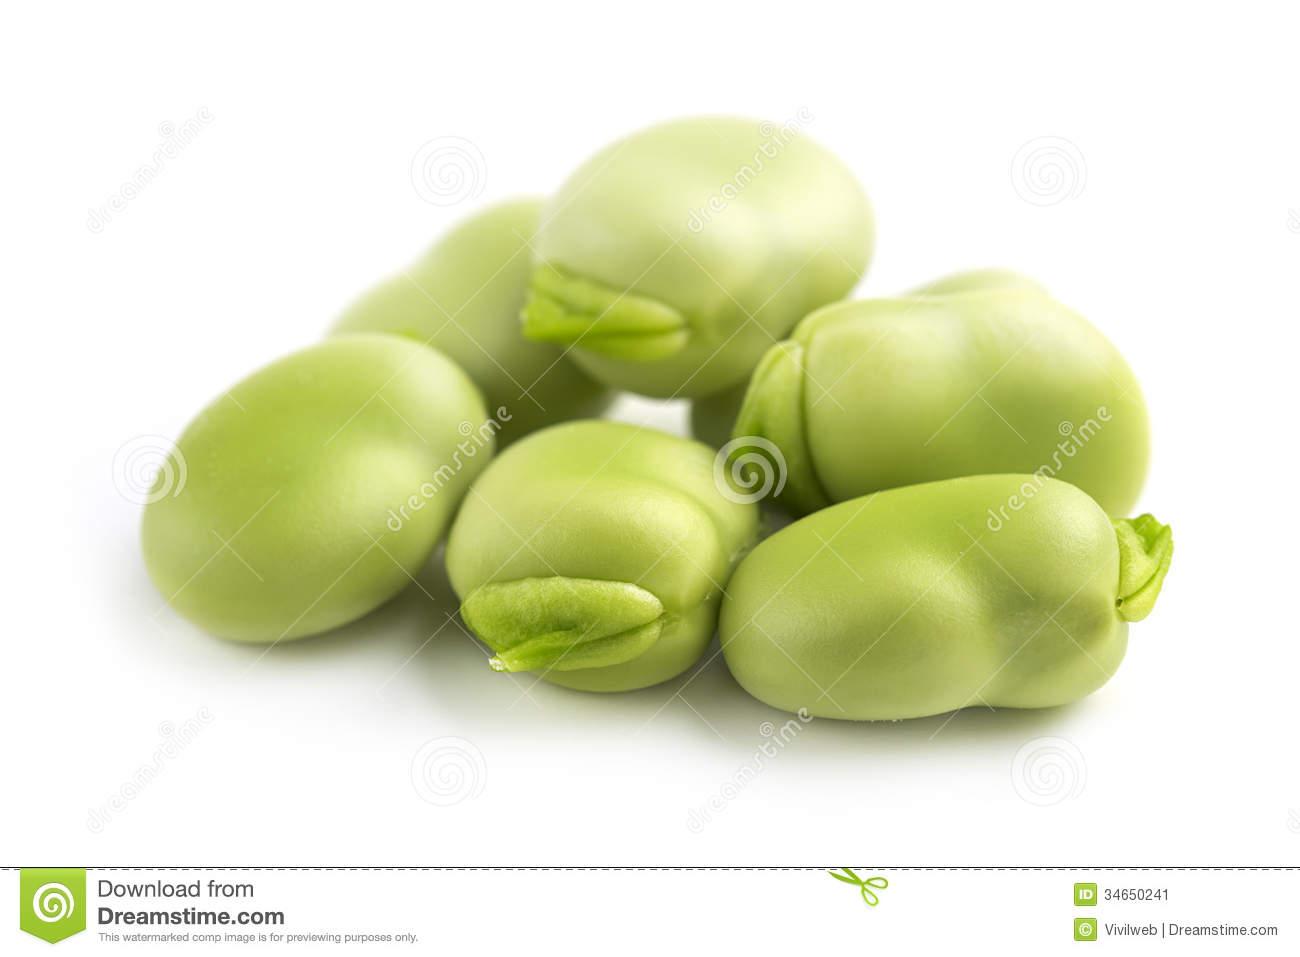 Broad bean clipart.